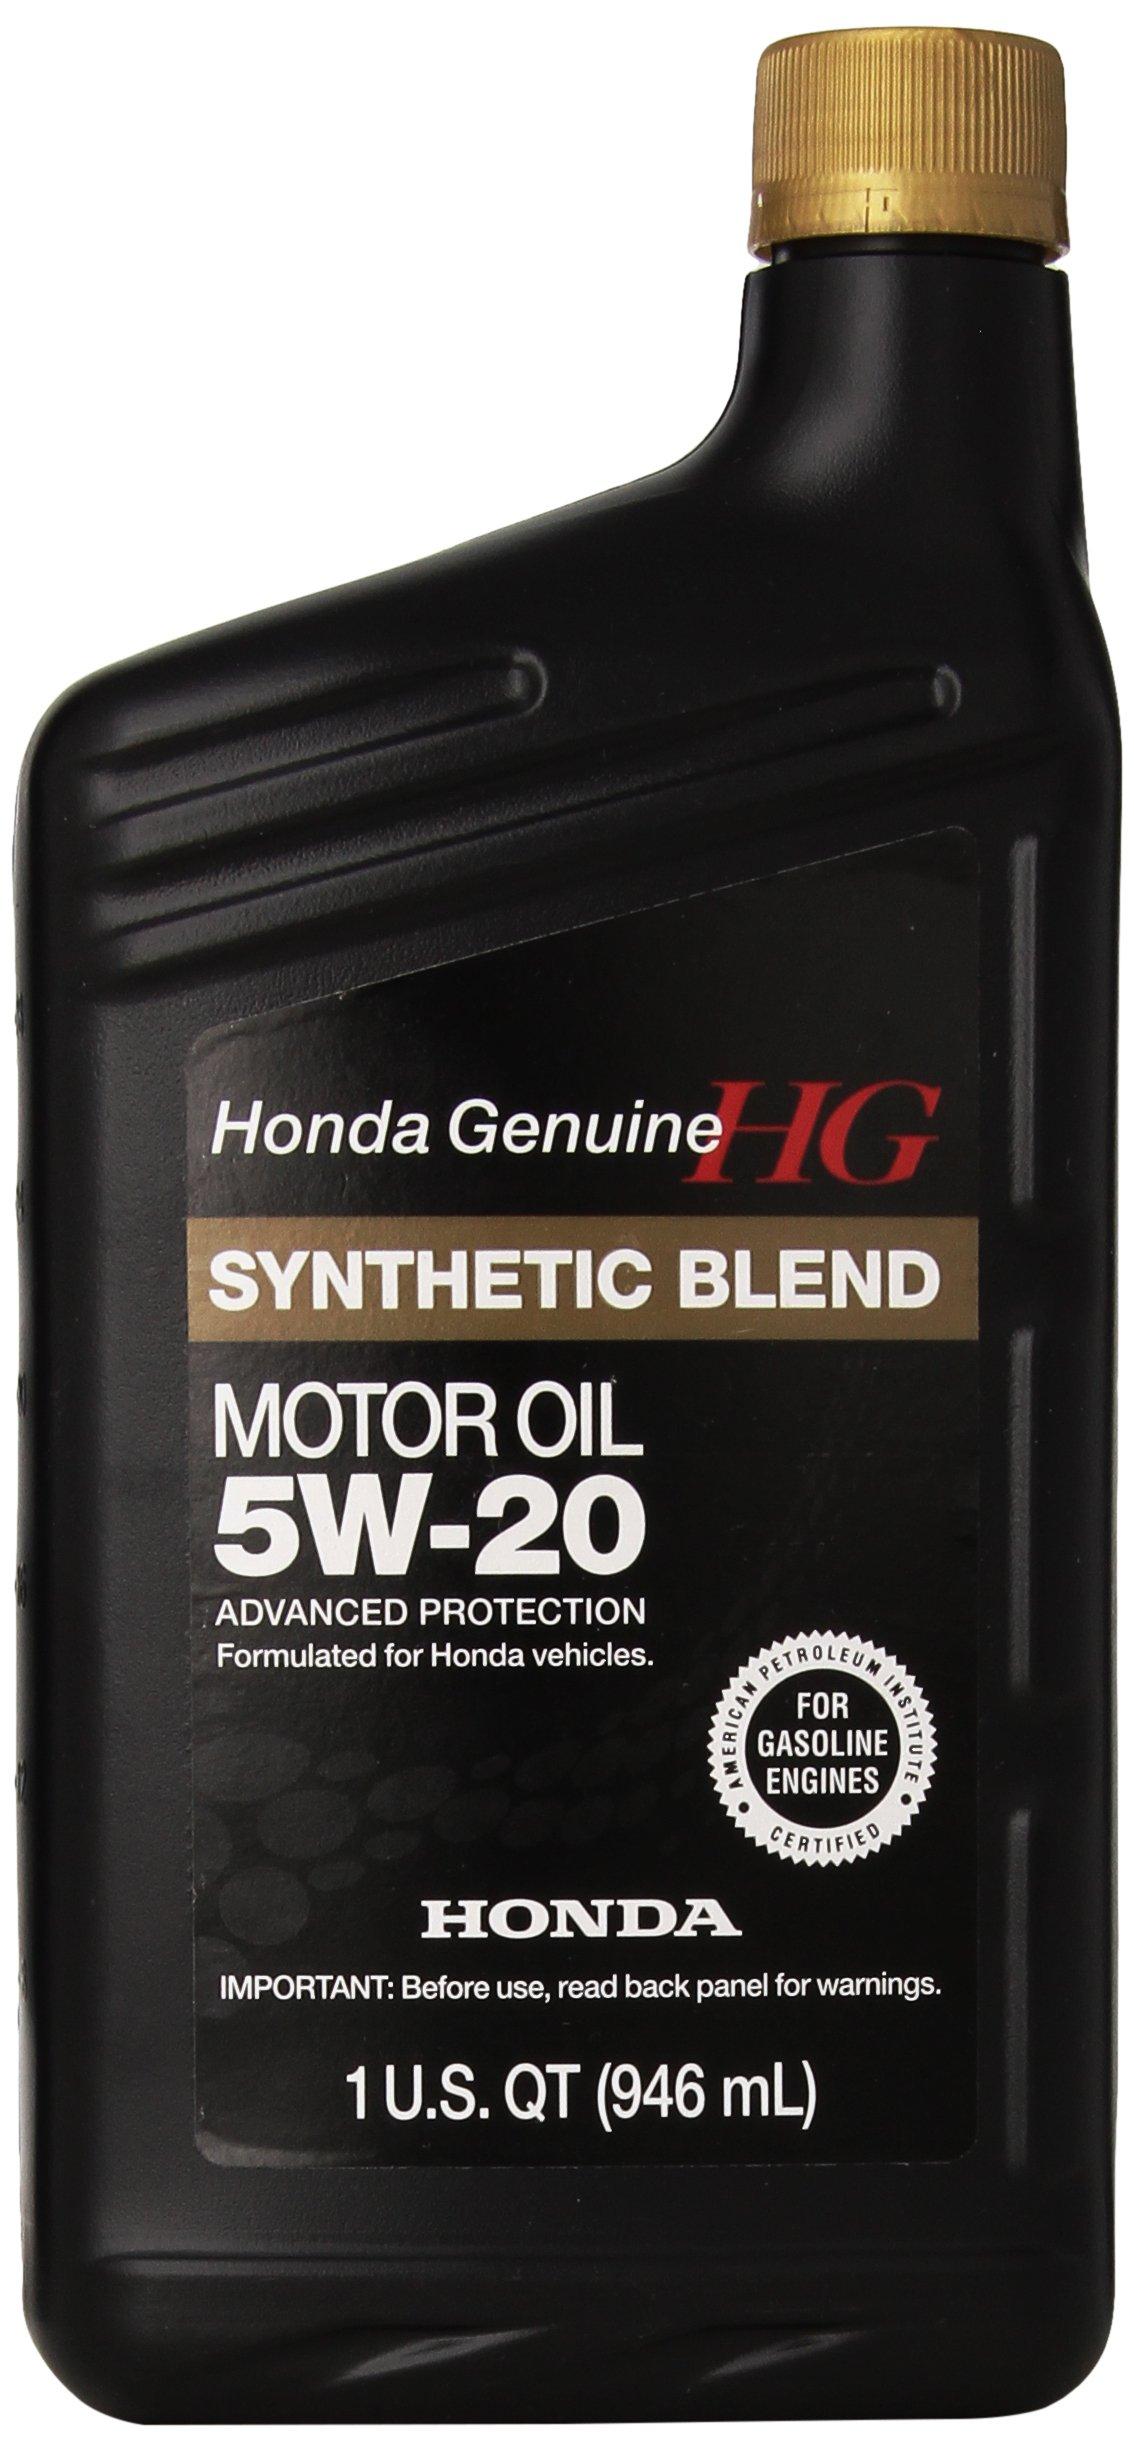 Genuine Honda 08798-9032 Synthetic Blend Oil 5W-20